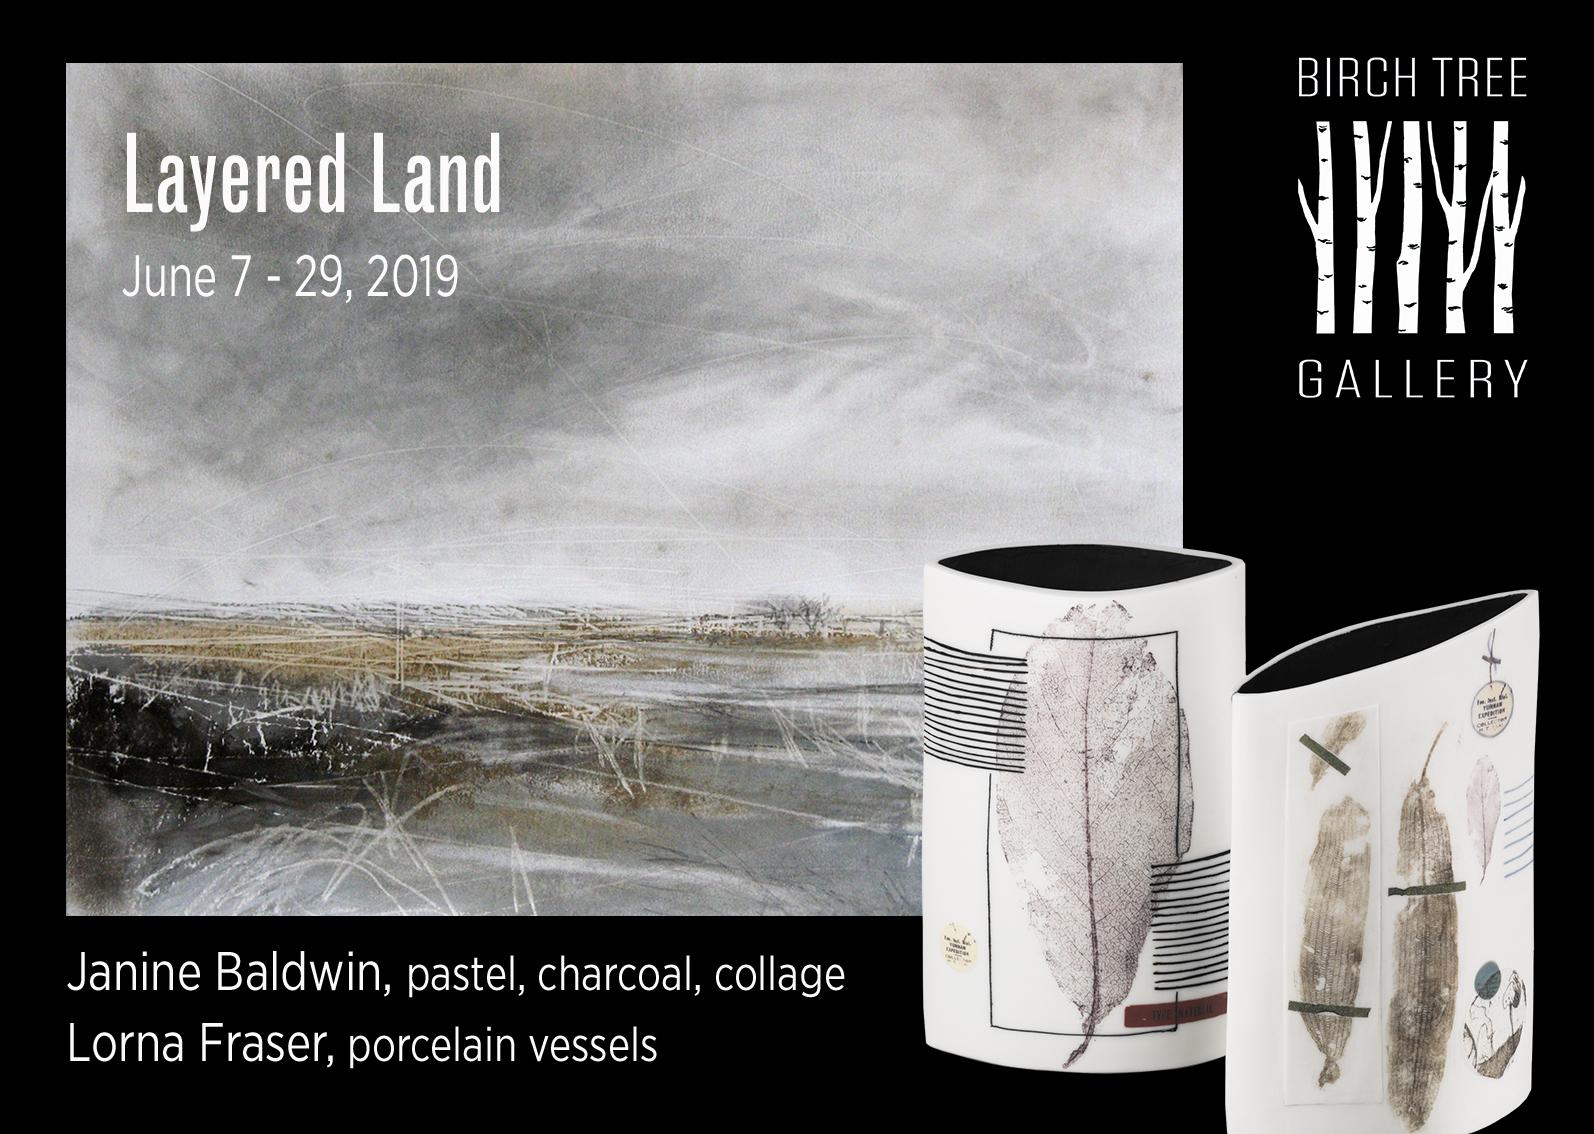 Birch Tree Gallery exhibition Layered Land